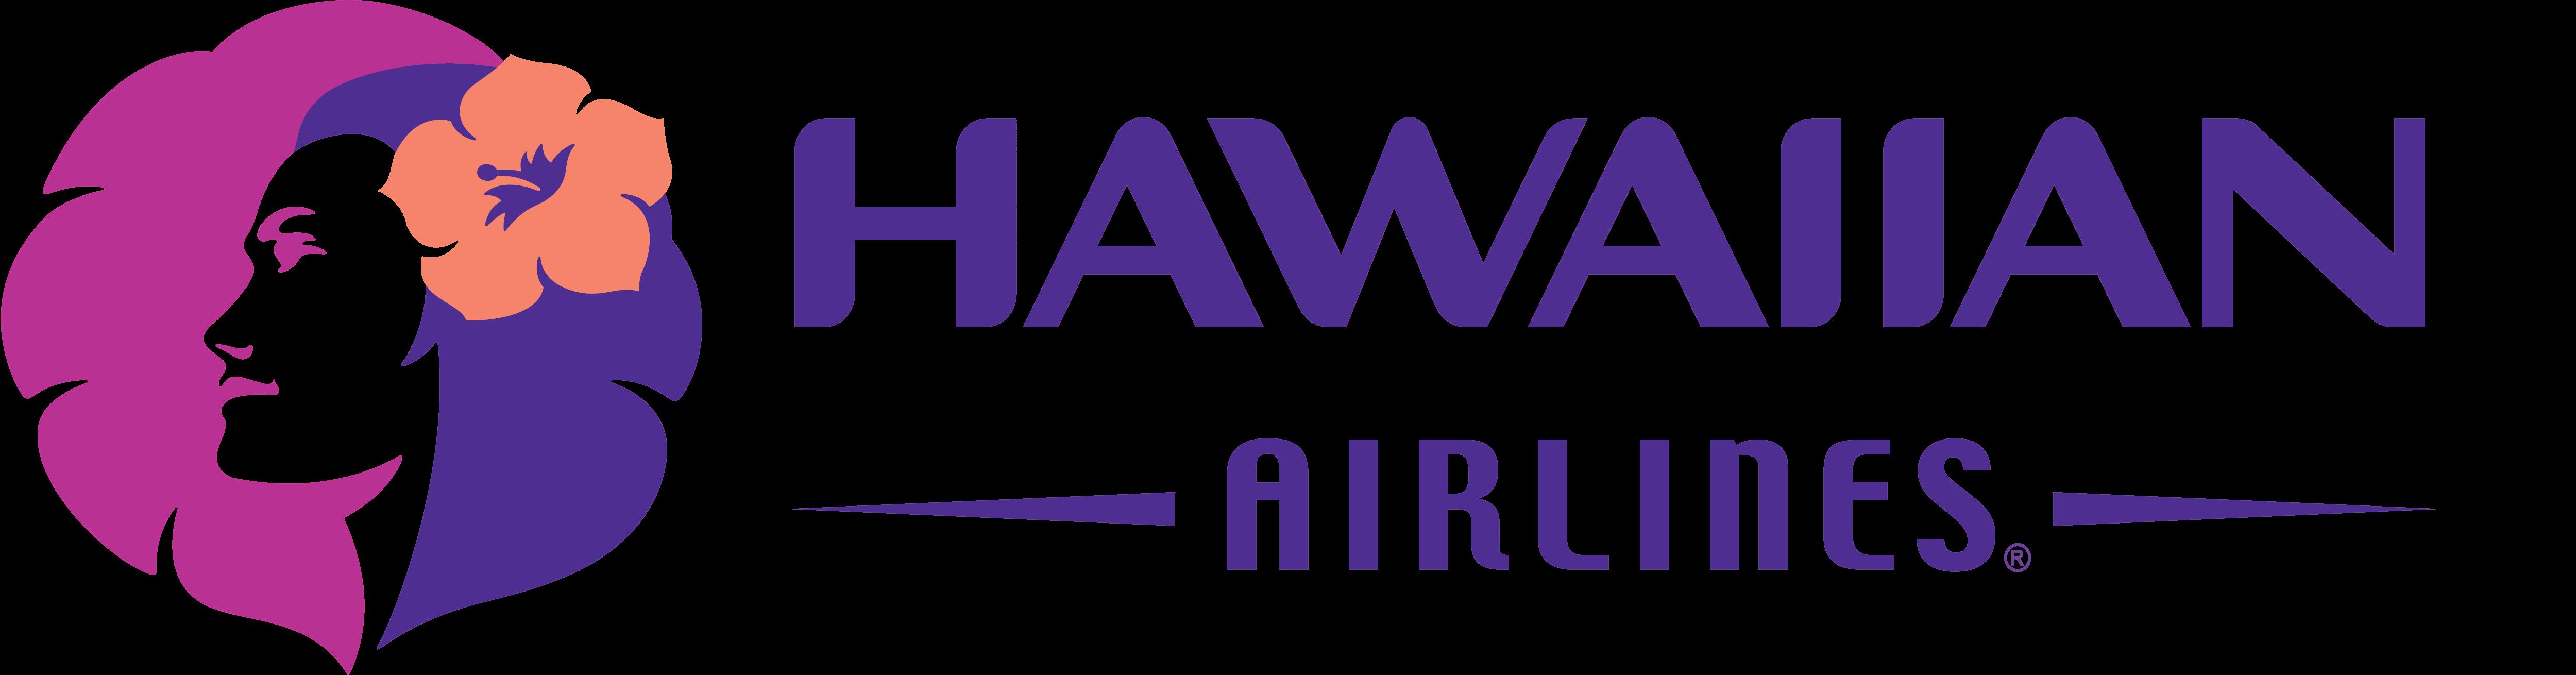 hawaiian airlines logos download Chic Fashion Clip Art high fashion model clipart